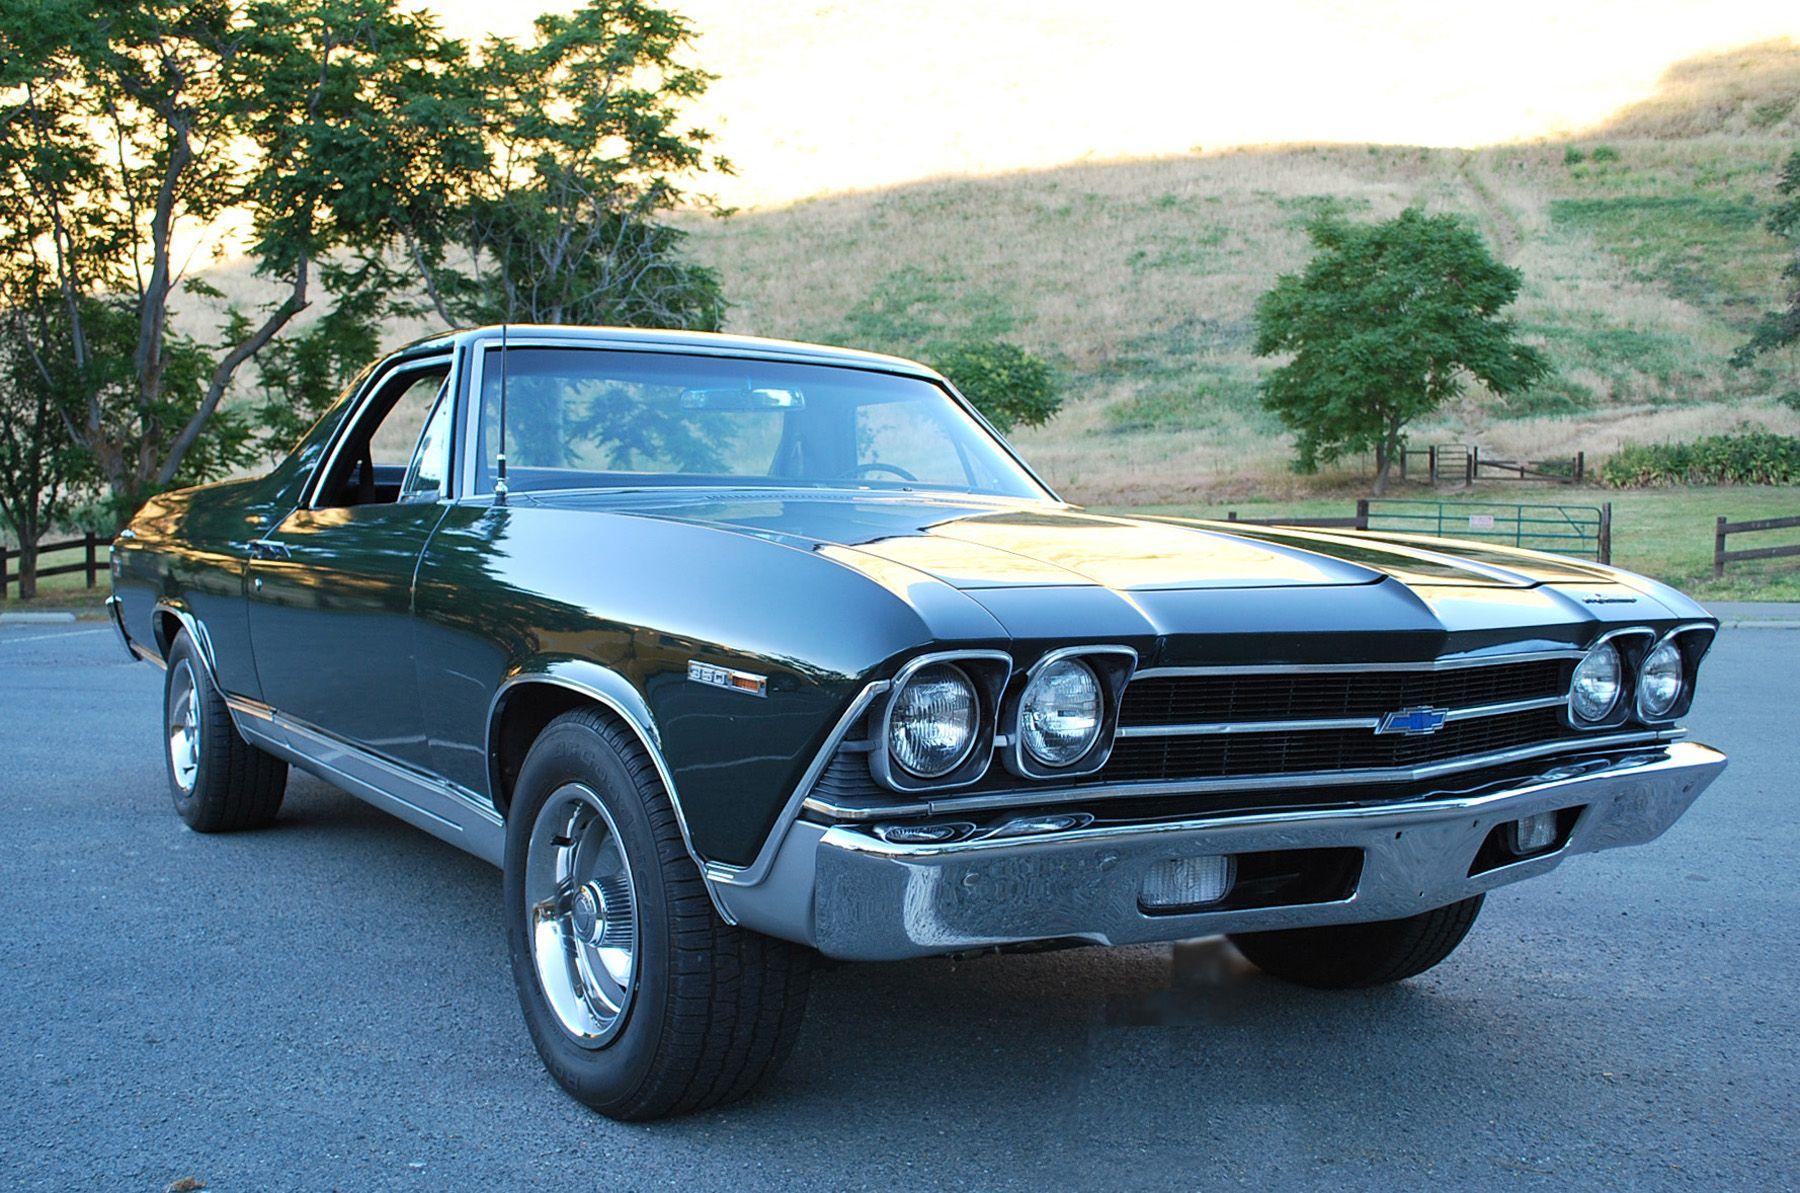 1969 Chevrolet El Camino Mine Was Black With Blue Pearl I Got It